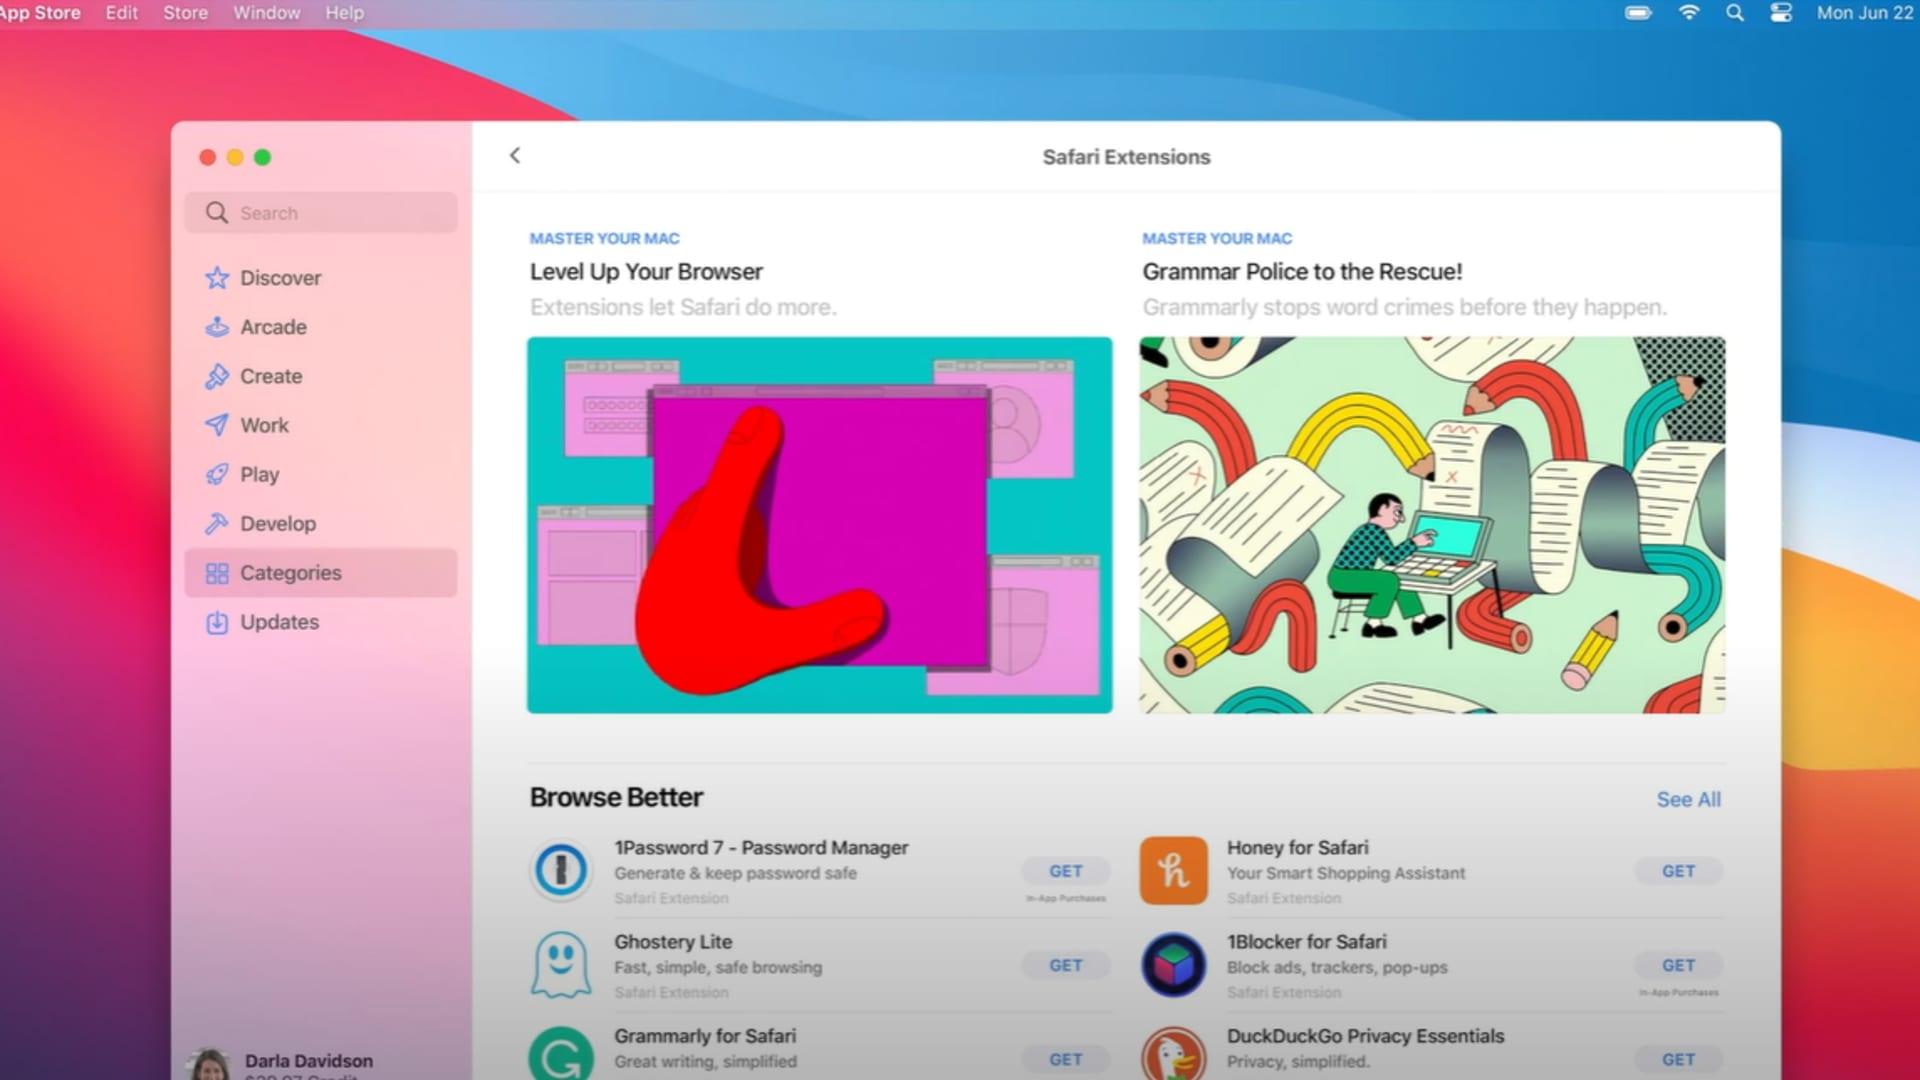 Safari extensions in macOS Big Sur